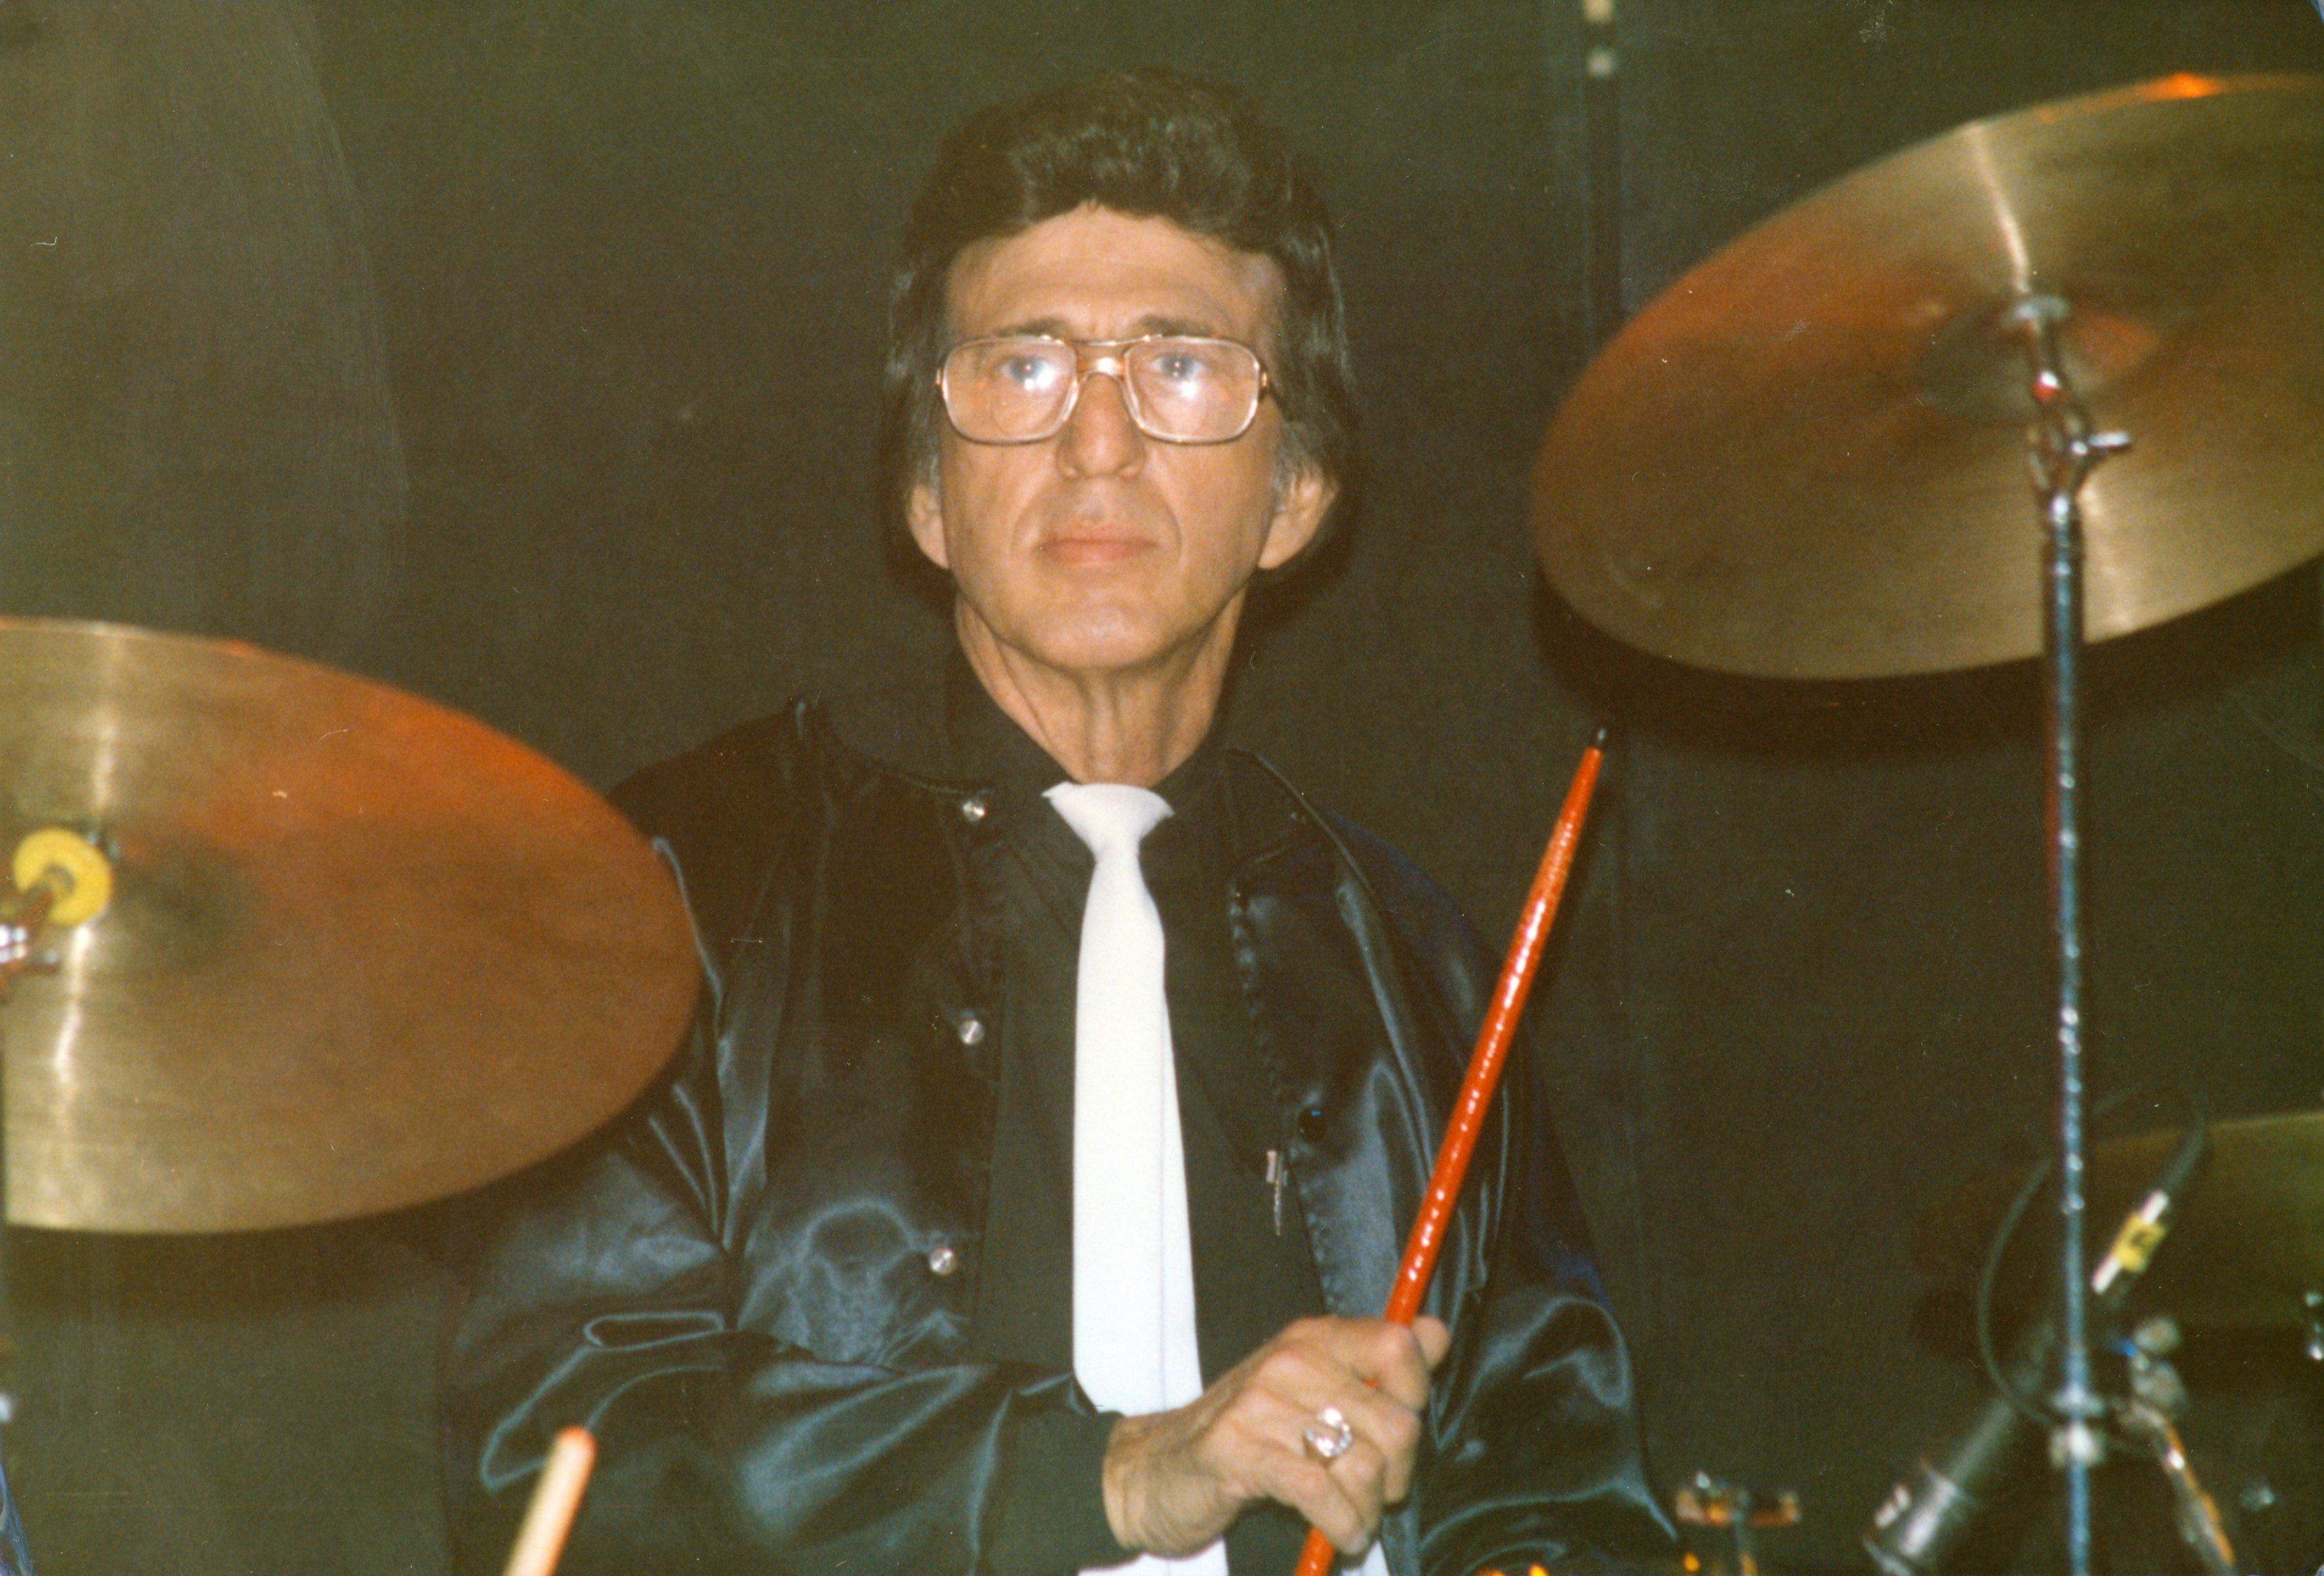 D.J. Fontana in London in 1988.